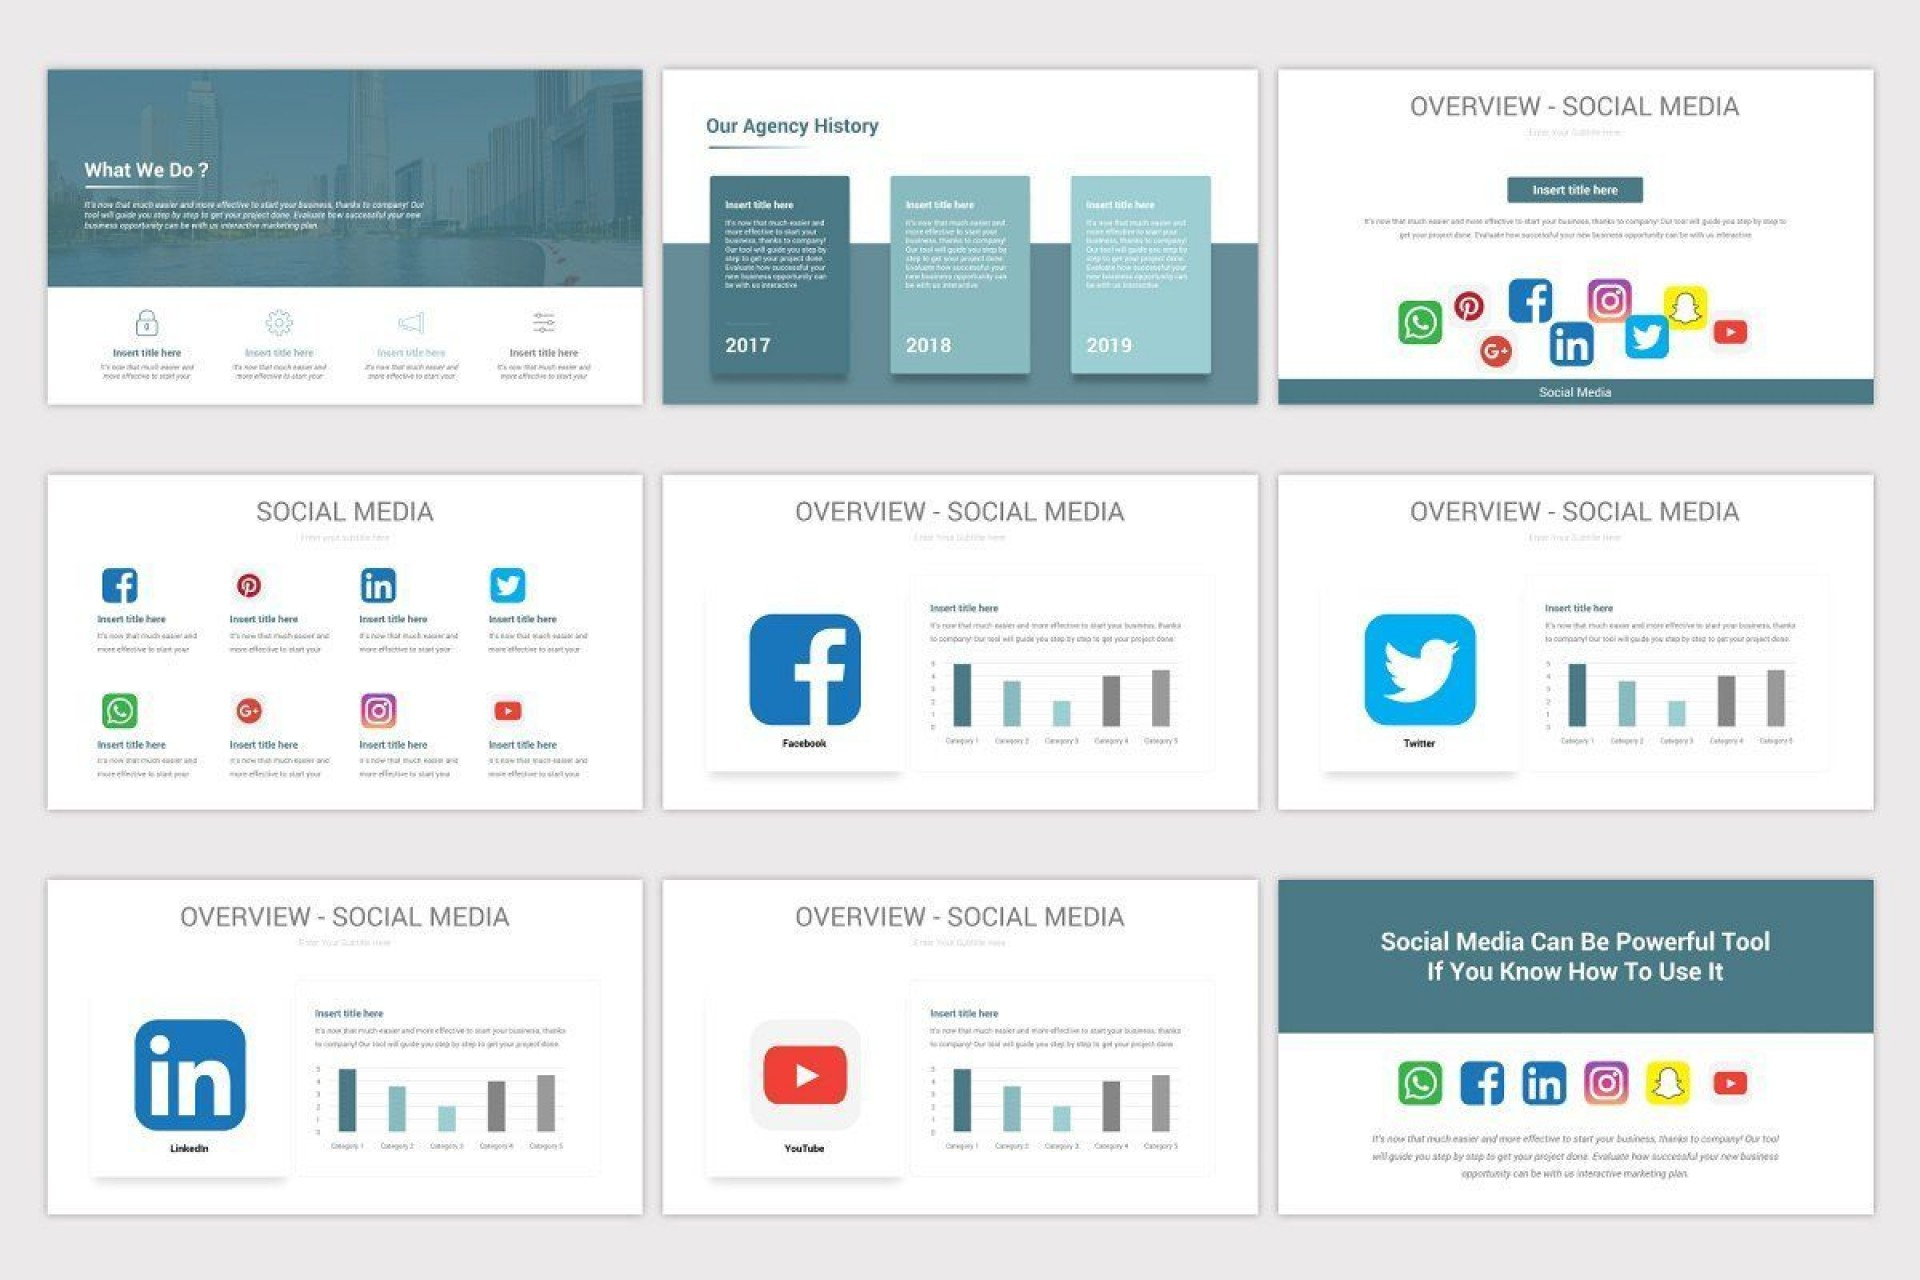 008 Awful Digital Marketing Plan Template 2019 Highest Quality 1920